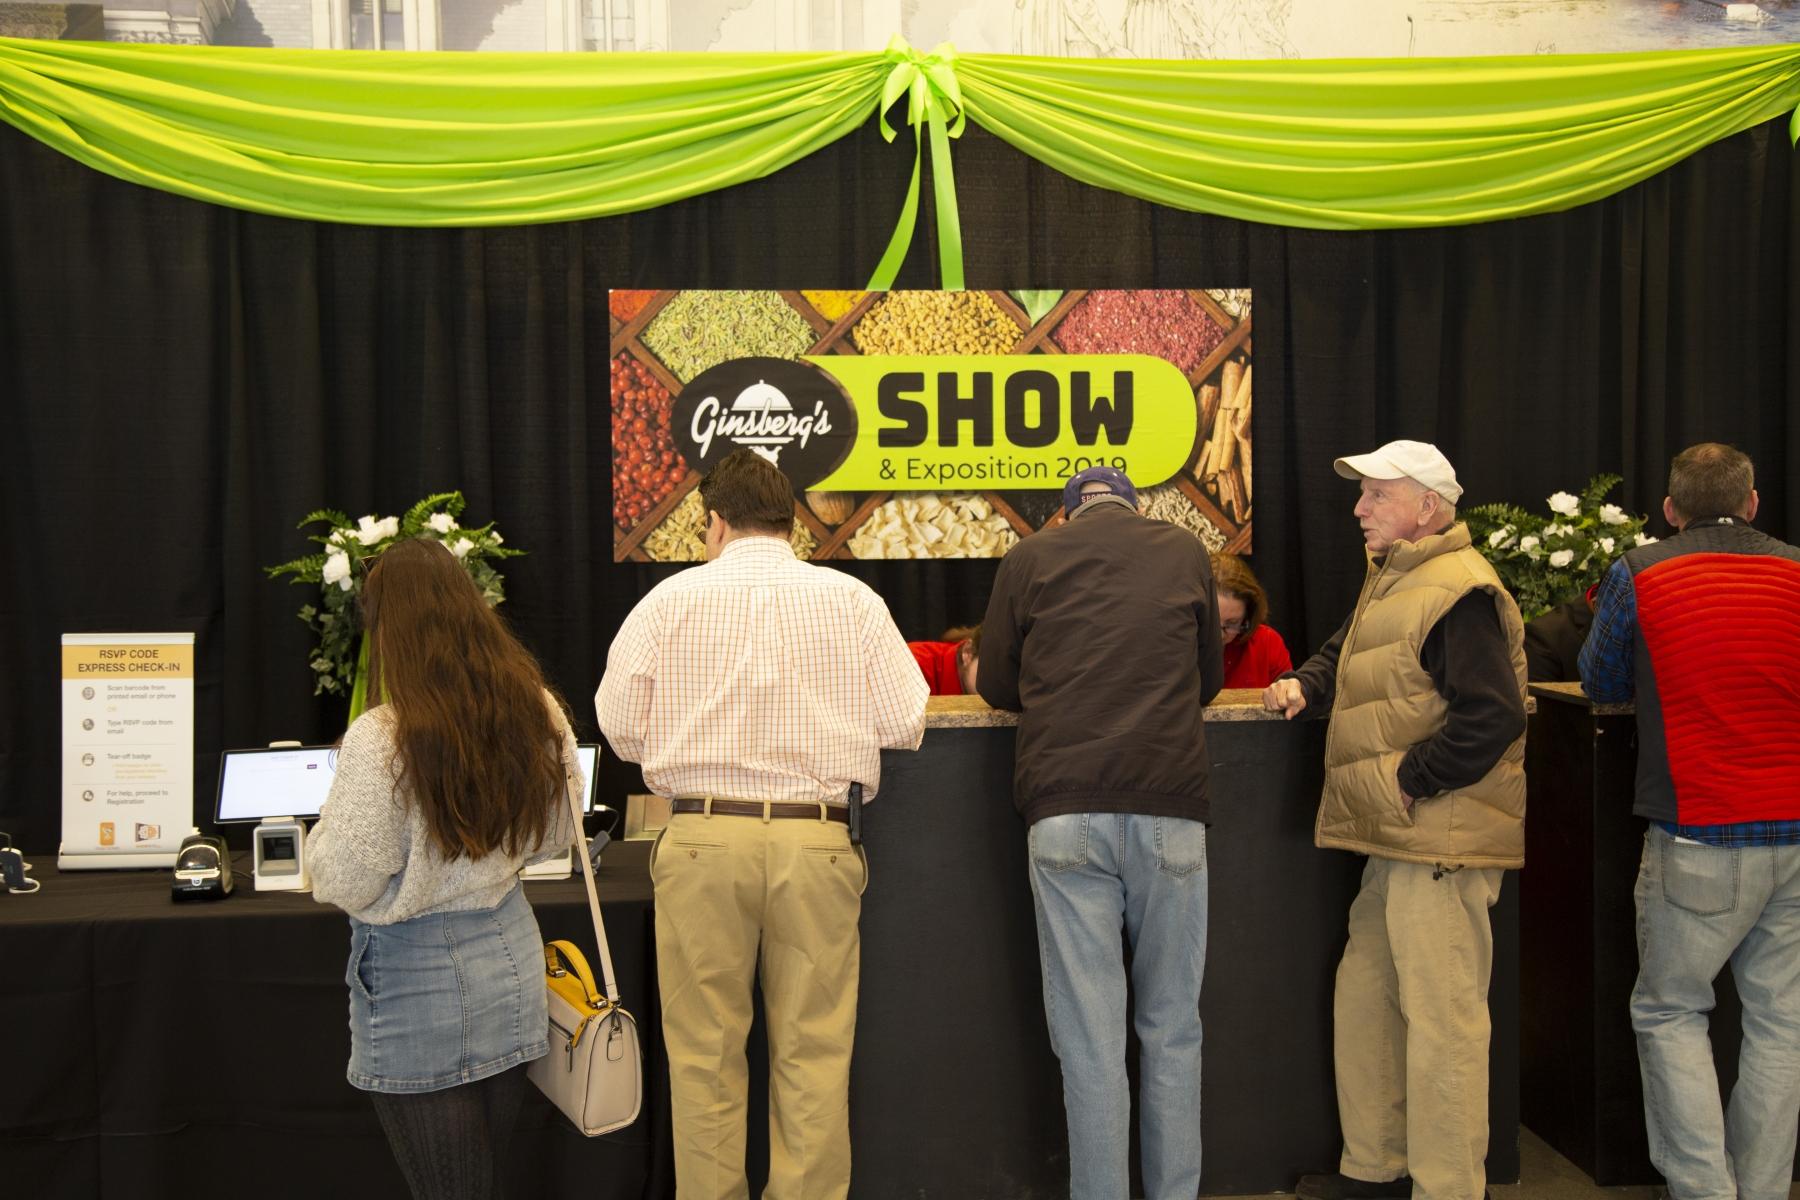 Food-Show-Entrance-Patrons-and-Signage-original